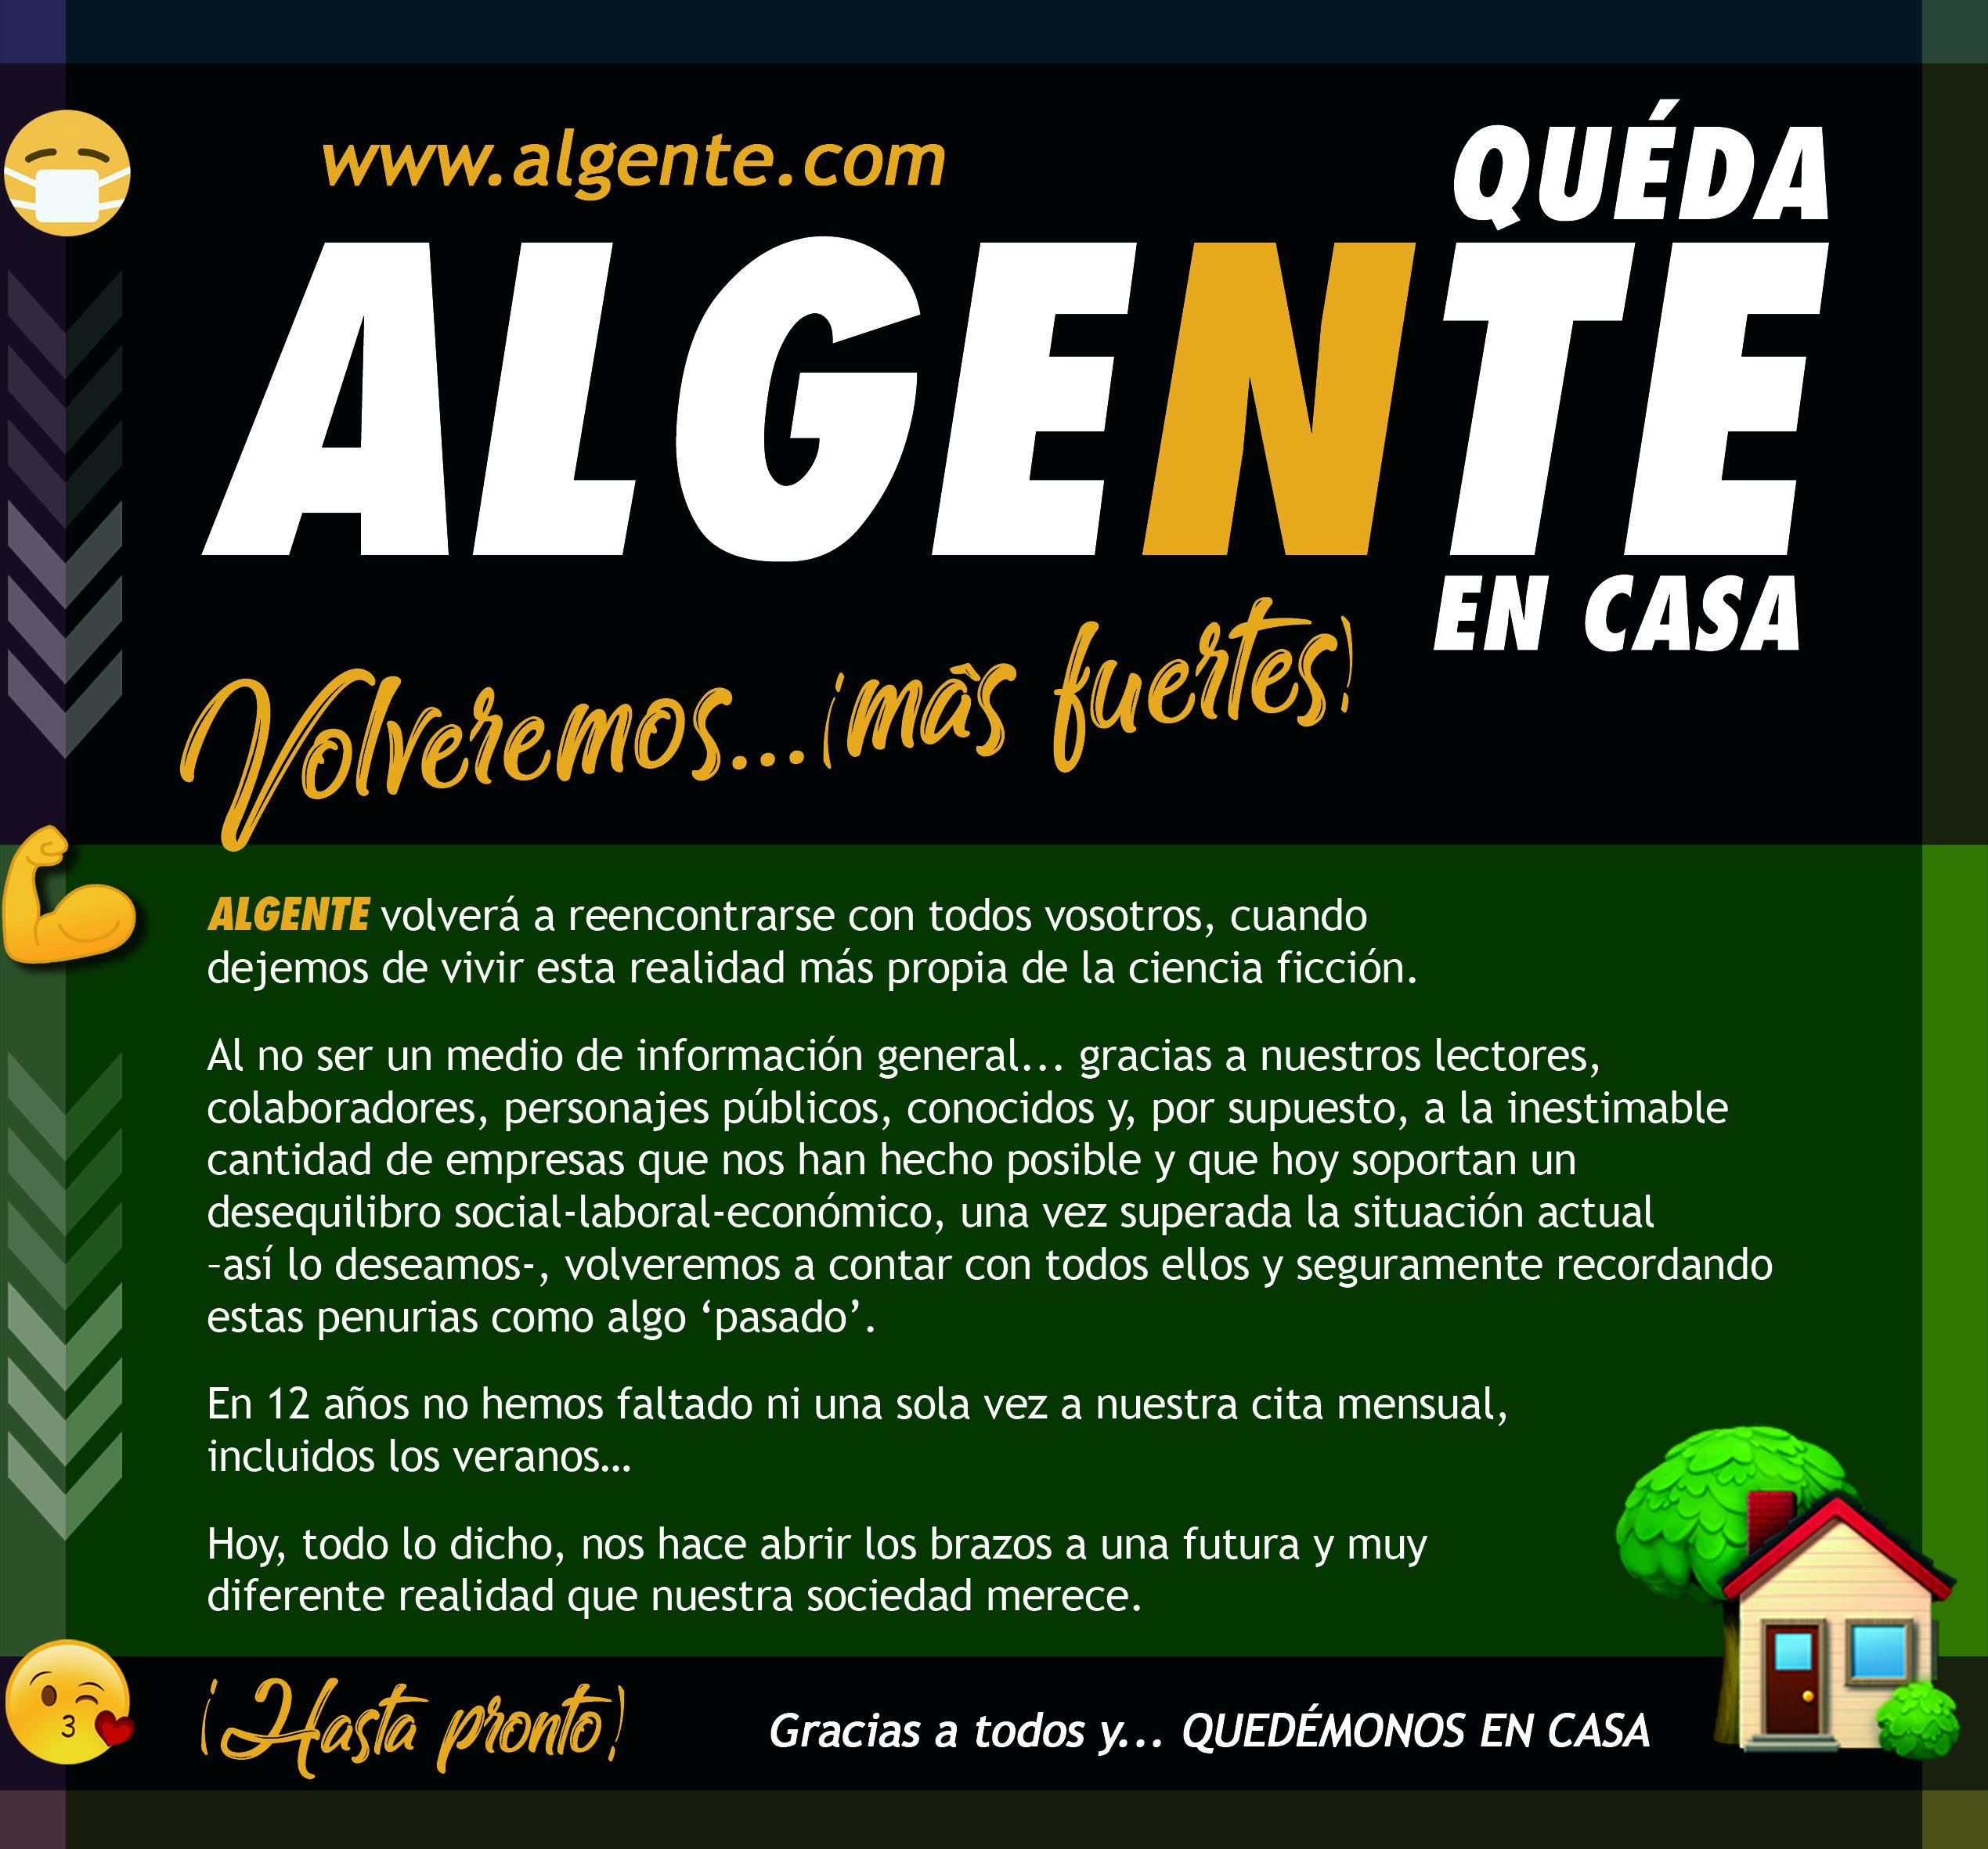 ALGENTE